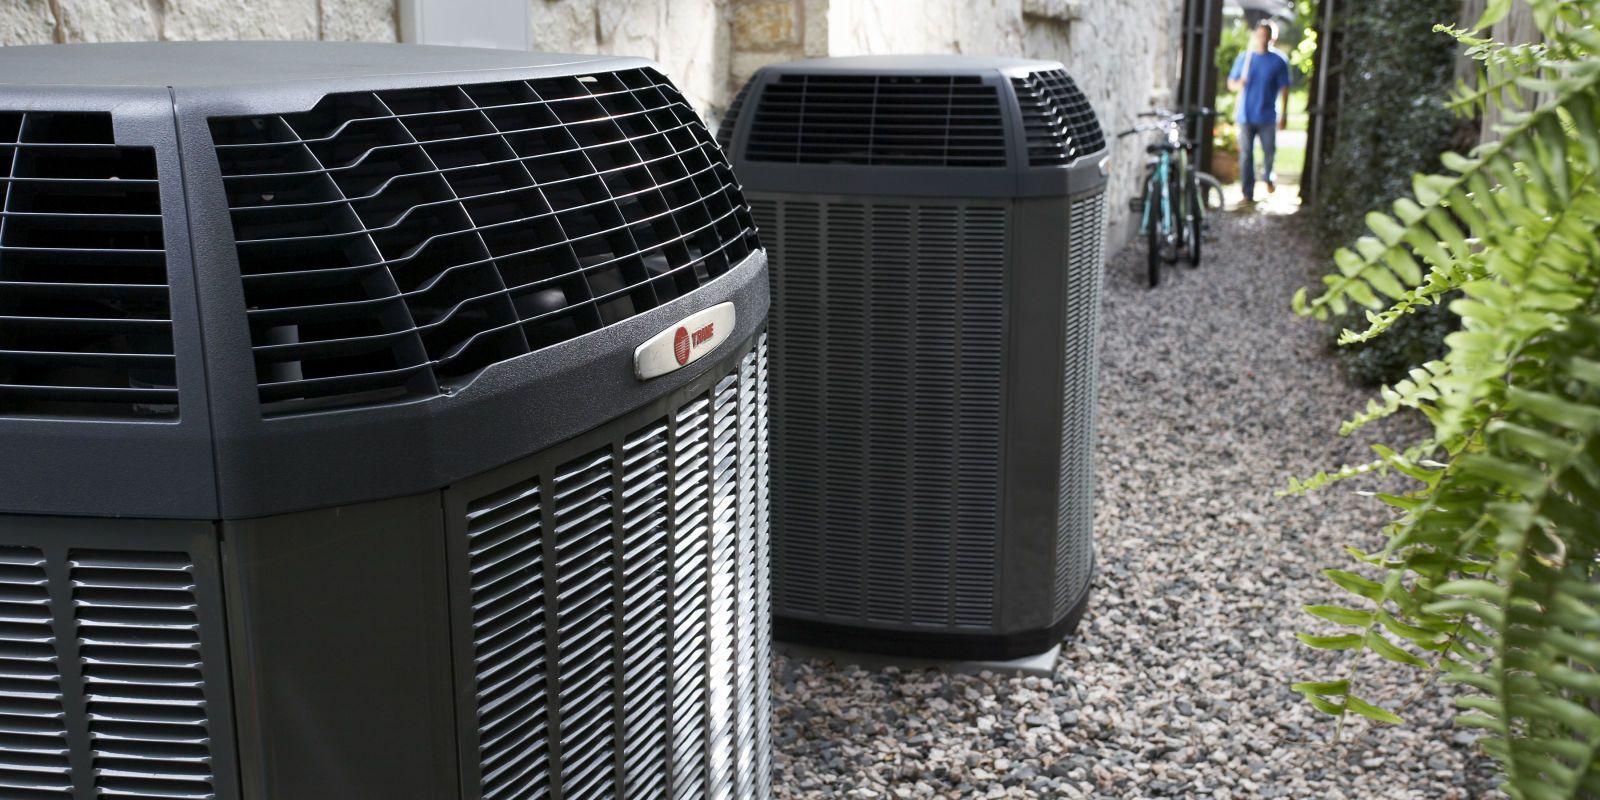 How to Fix a Broken Air Conditioner Broken air